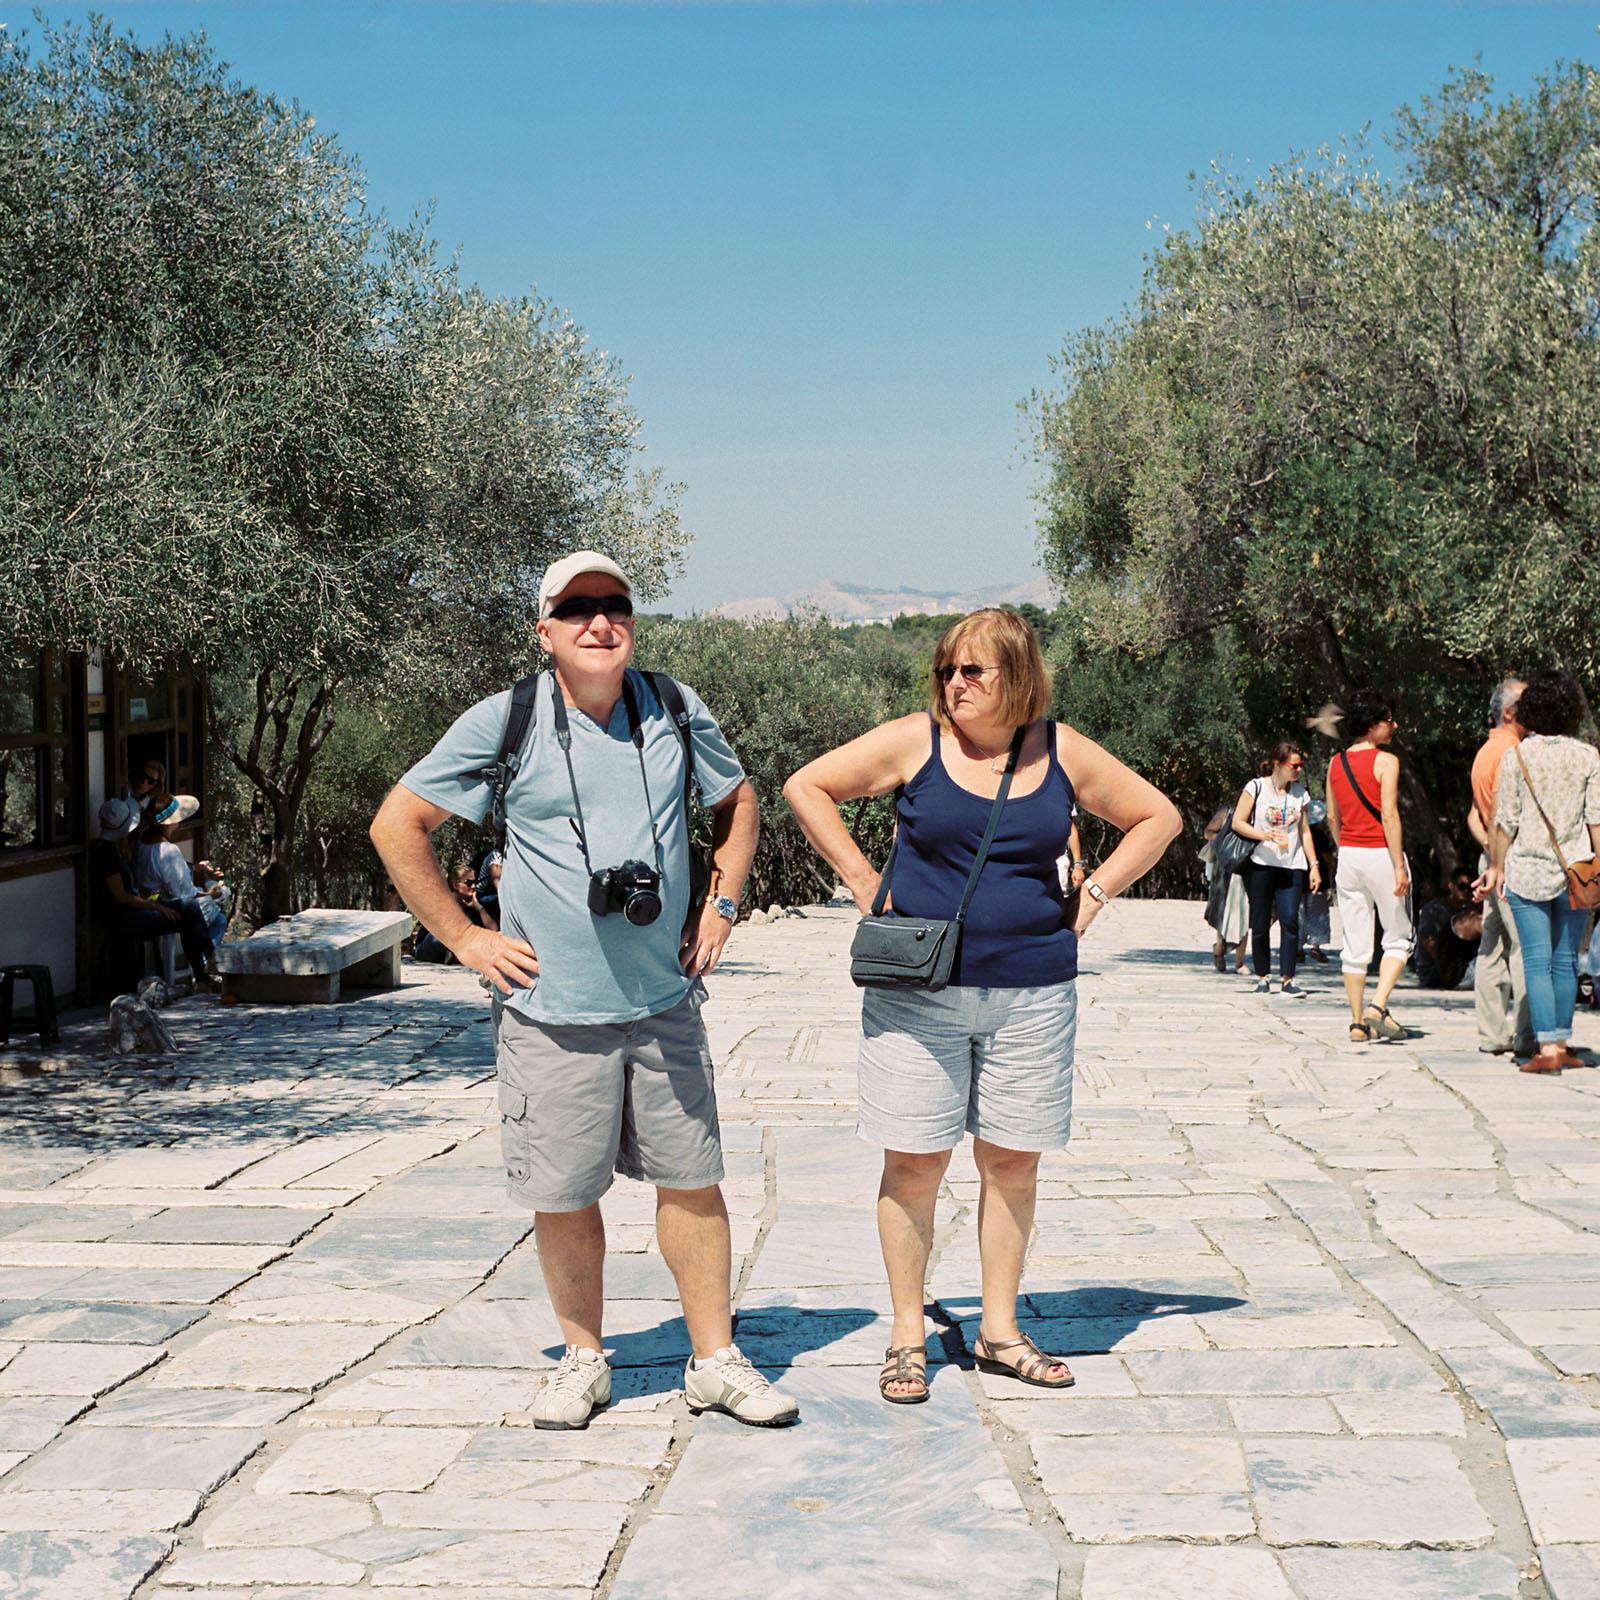 Greece_Parthenon_Tourists-Yashicamat124g_03.jpg